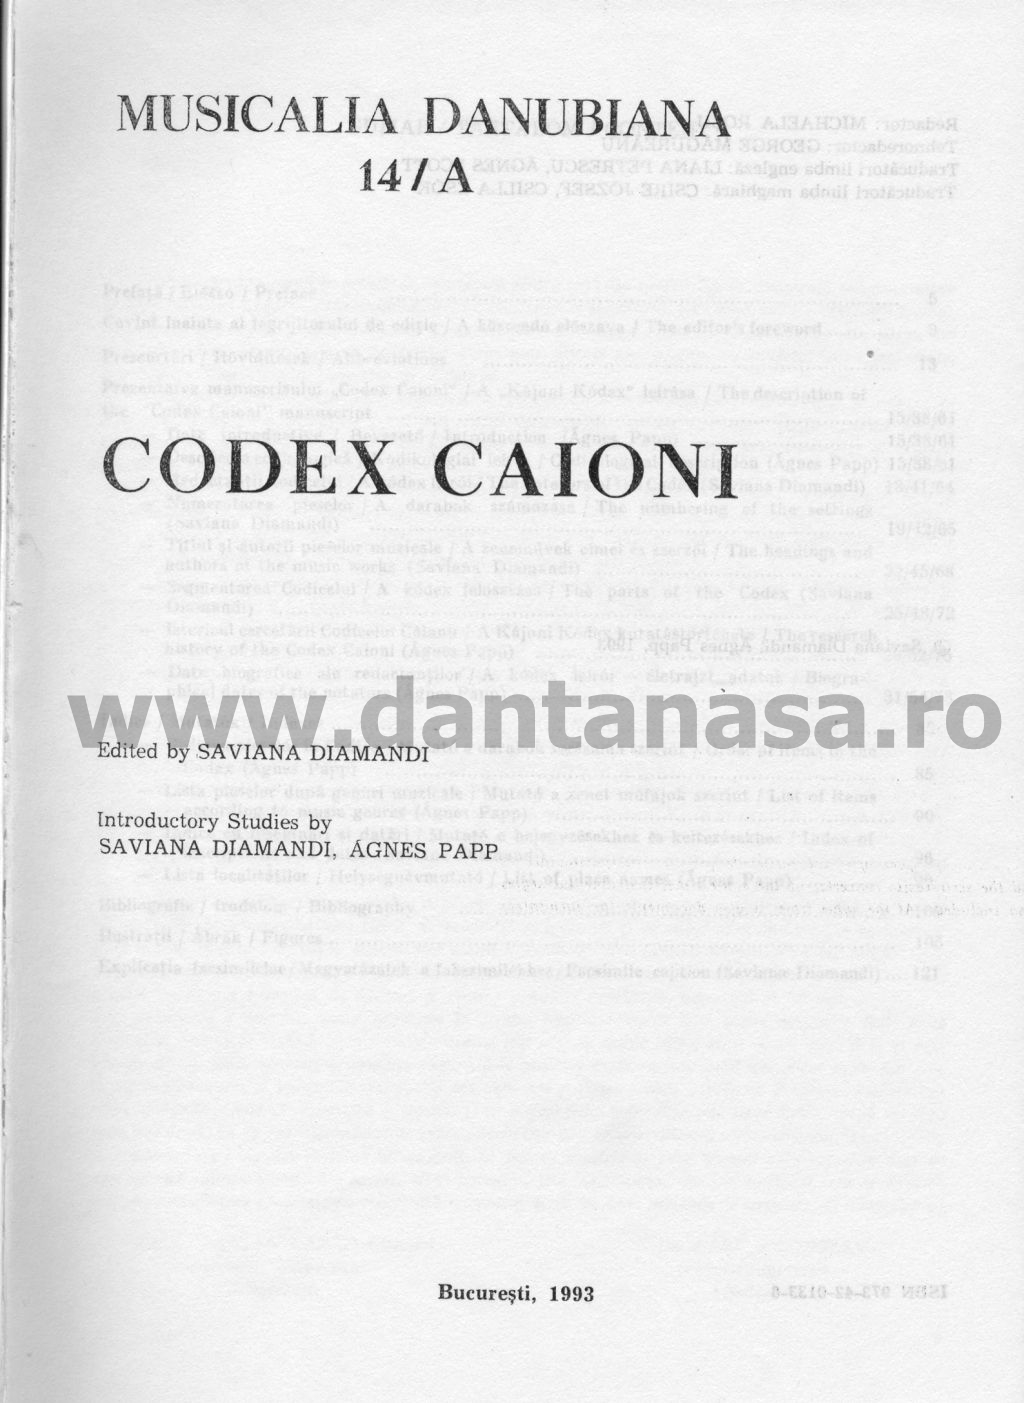 Codex Caioni Ioan Caianul 1